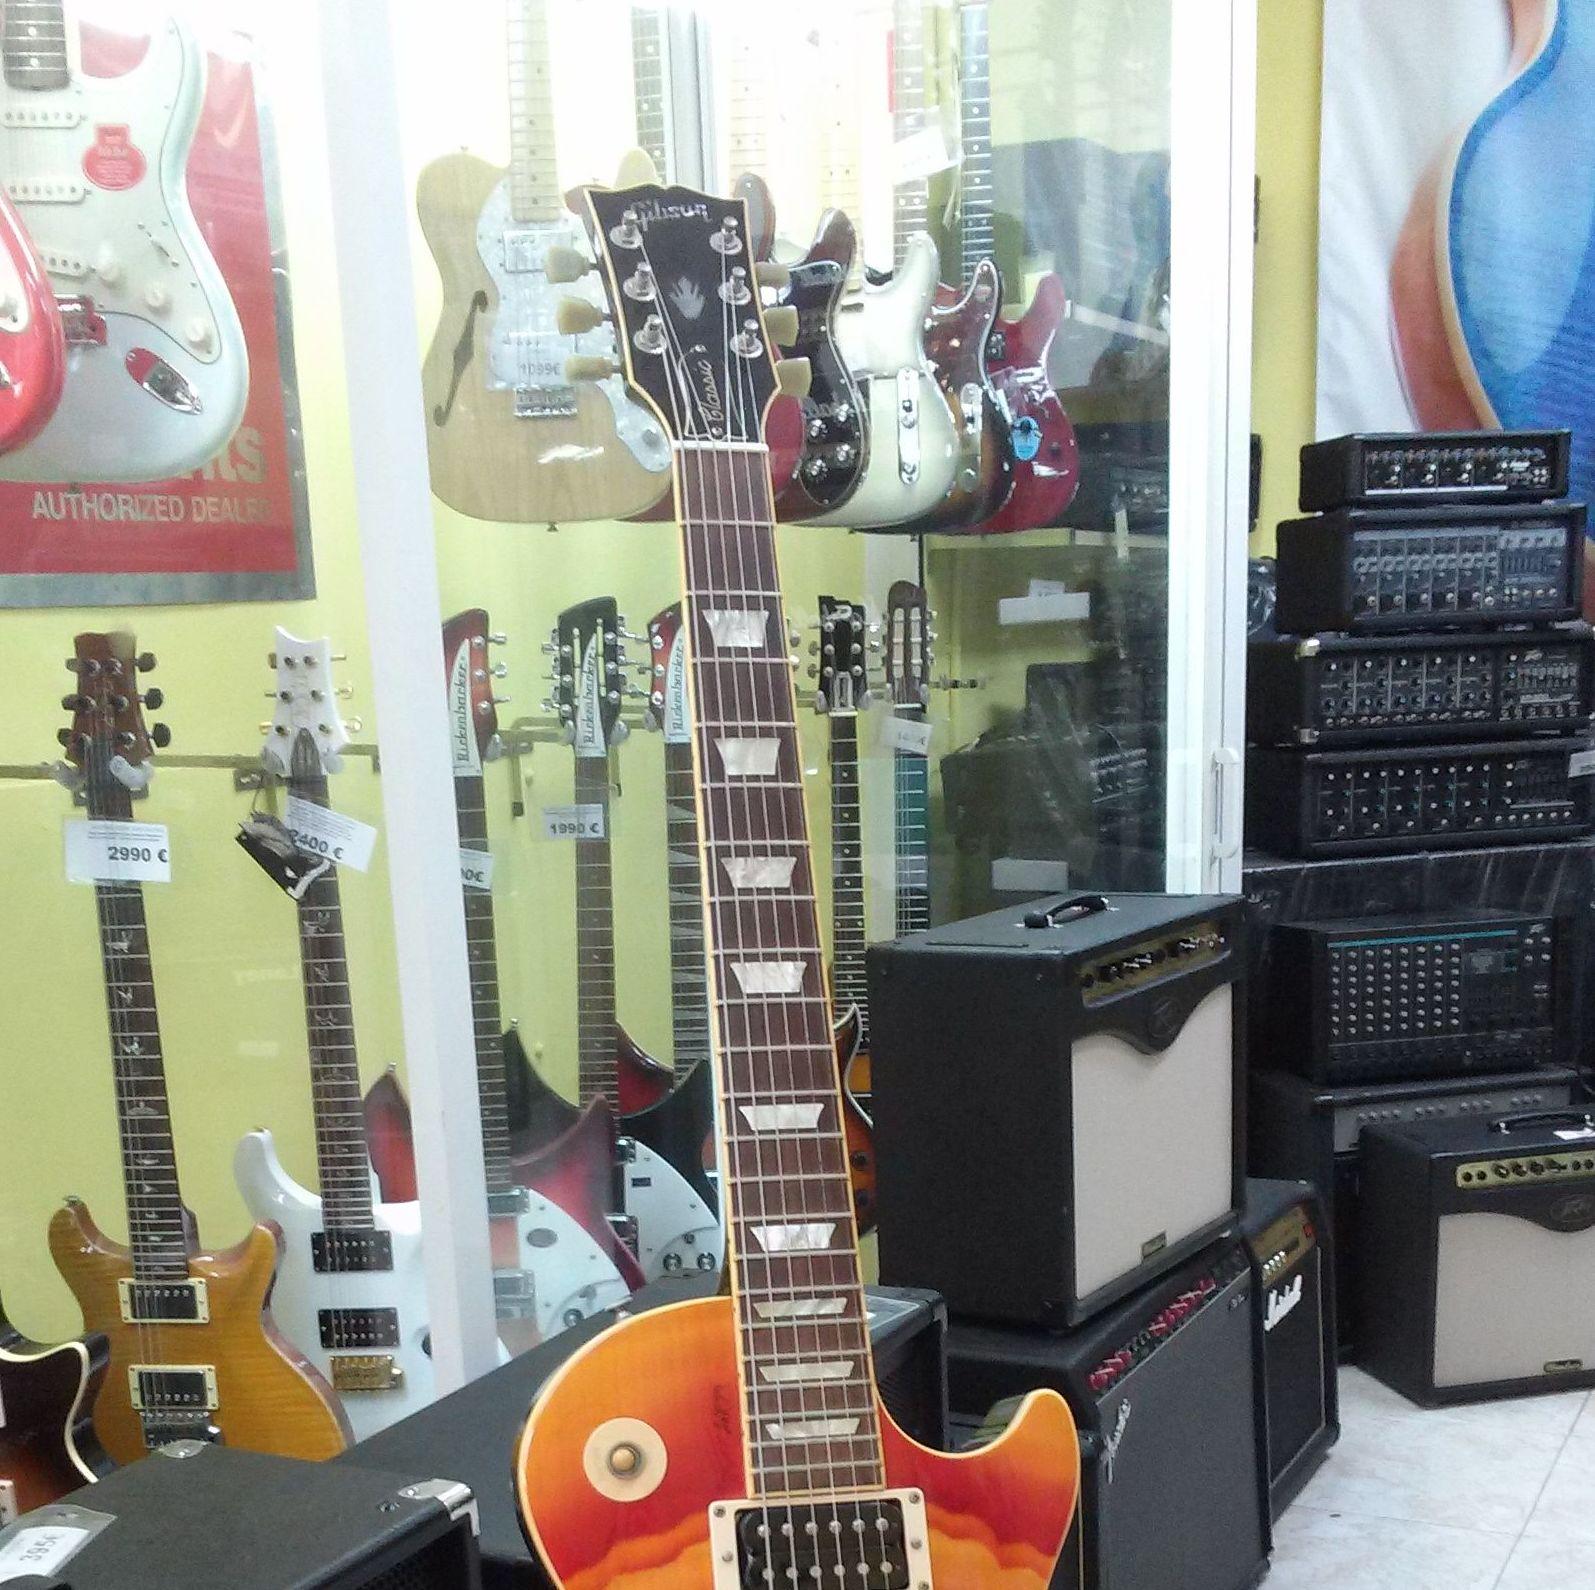 Picture 85 of Instrumentos de música in Barcelona | Guitar Shop Barcelona